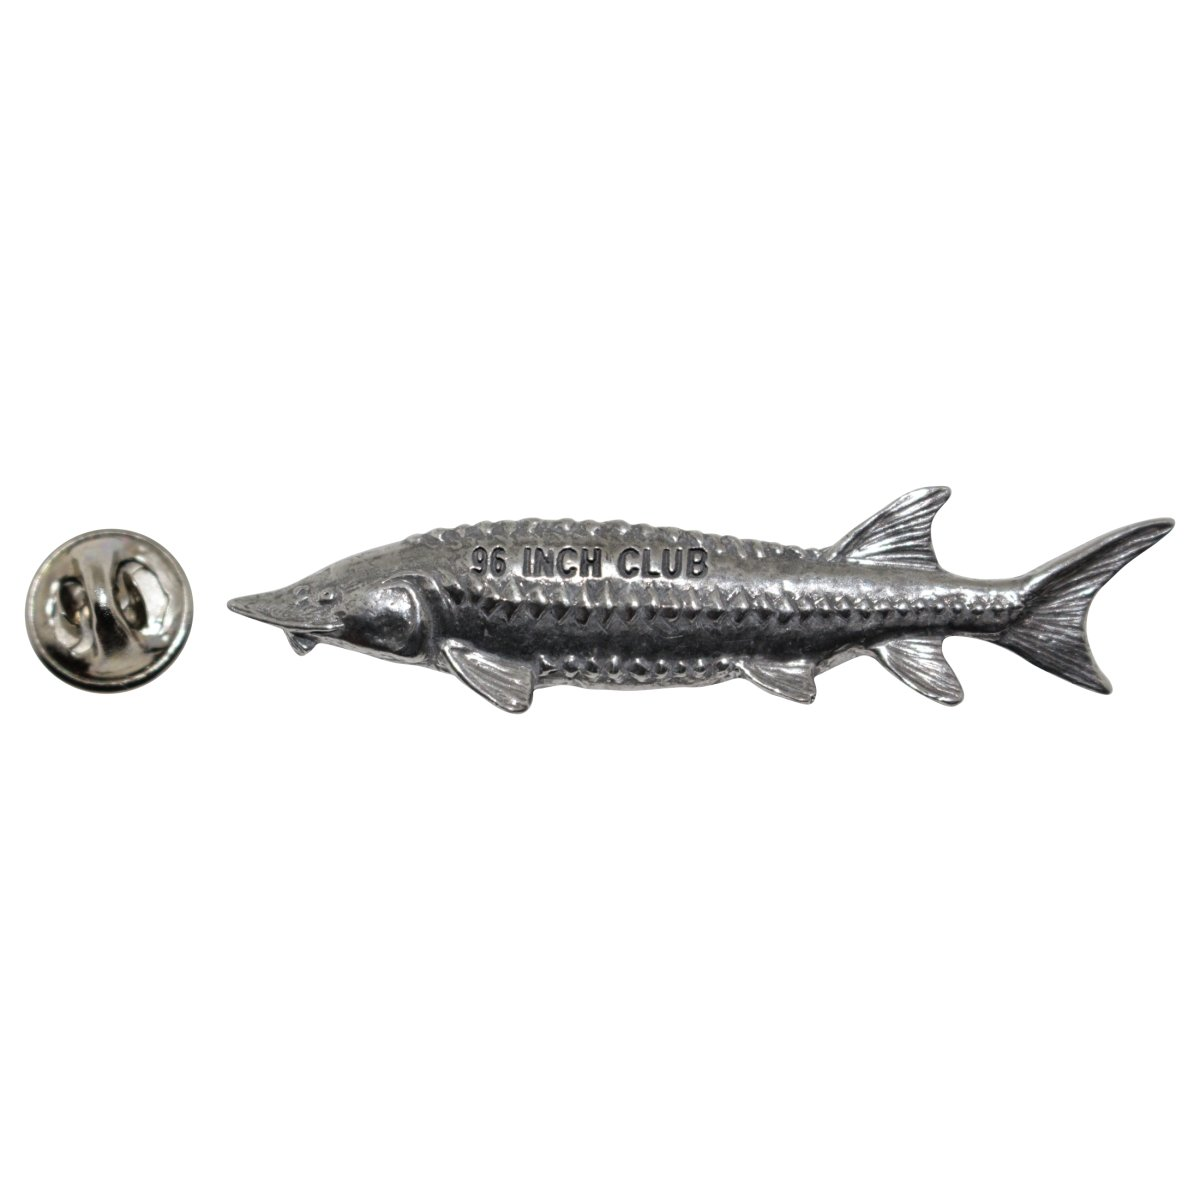 Sturgeon 96 Club Pewter Lapel Pin Fishing Trophy Jewelry P396